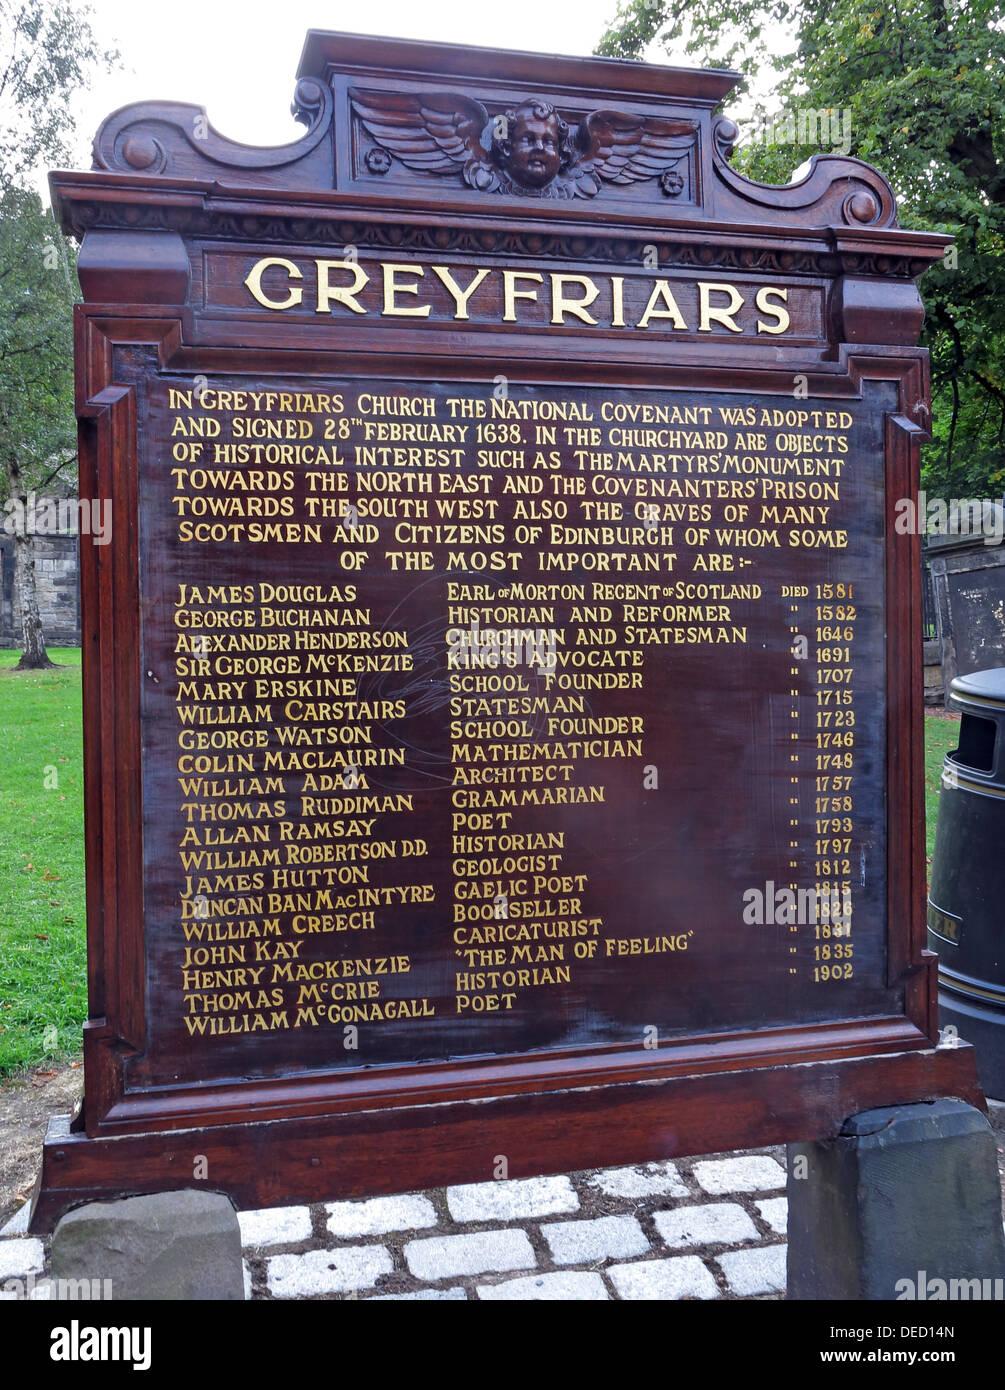 Greyfriars Kirkyard entrance Edinburgh Capital City, Scotland UK - Stock Image